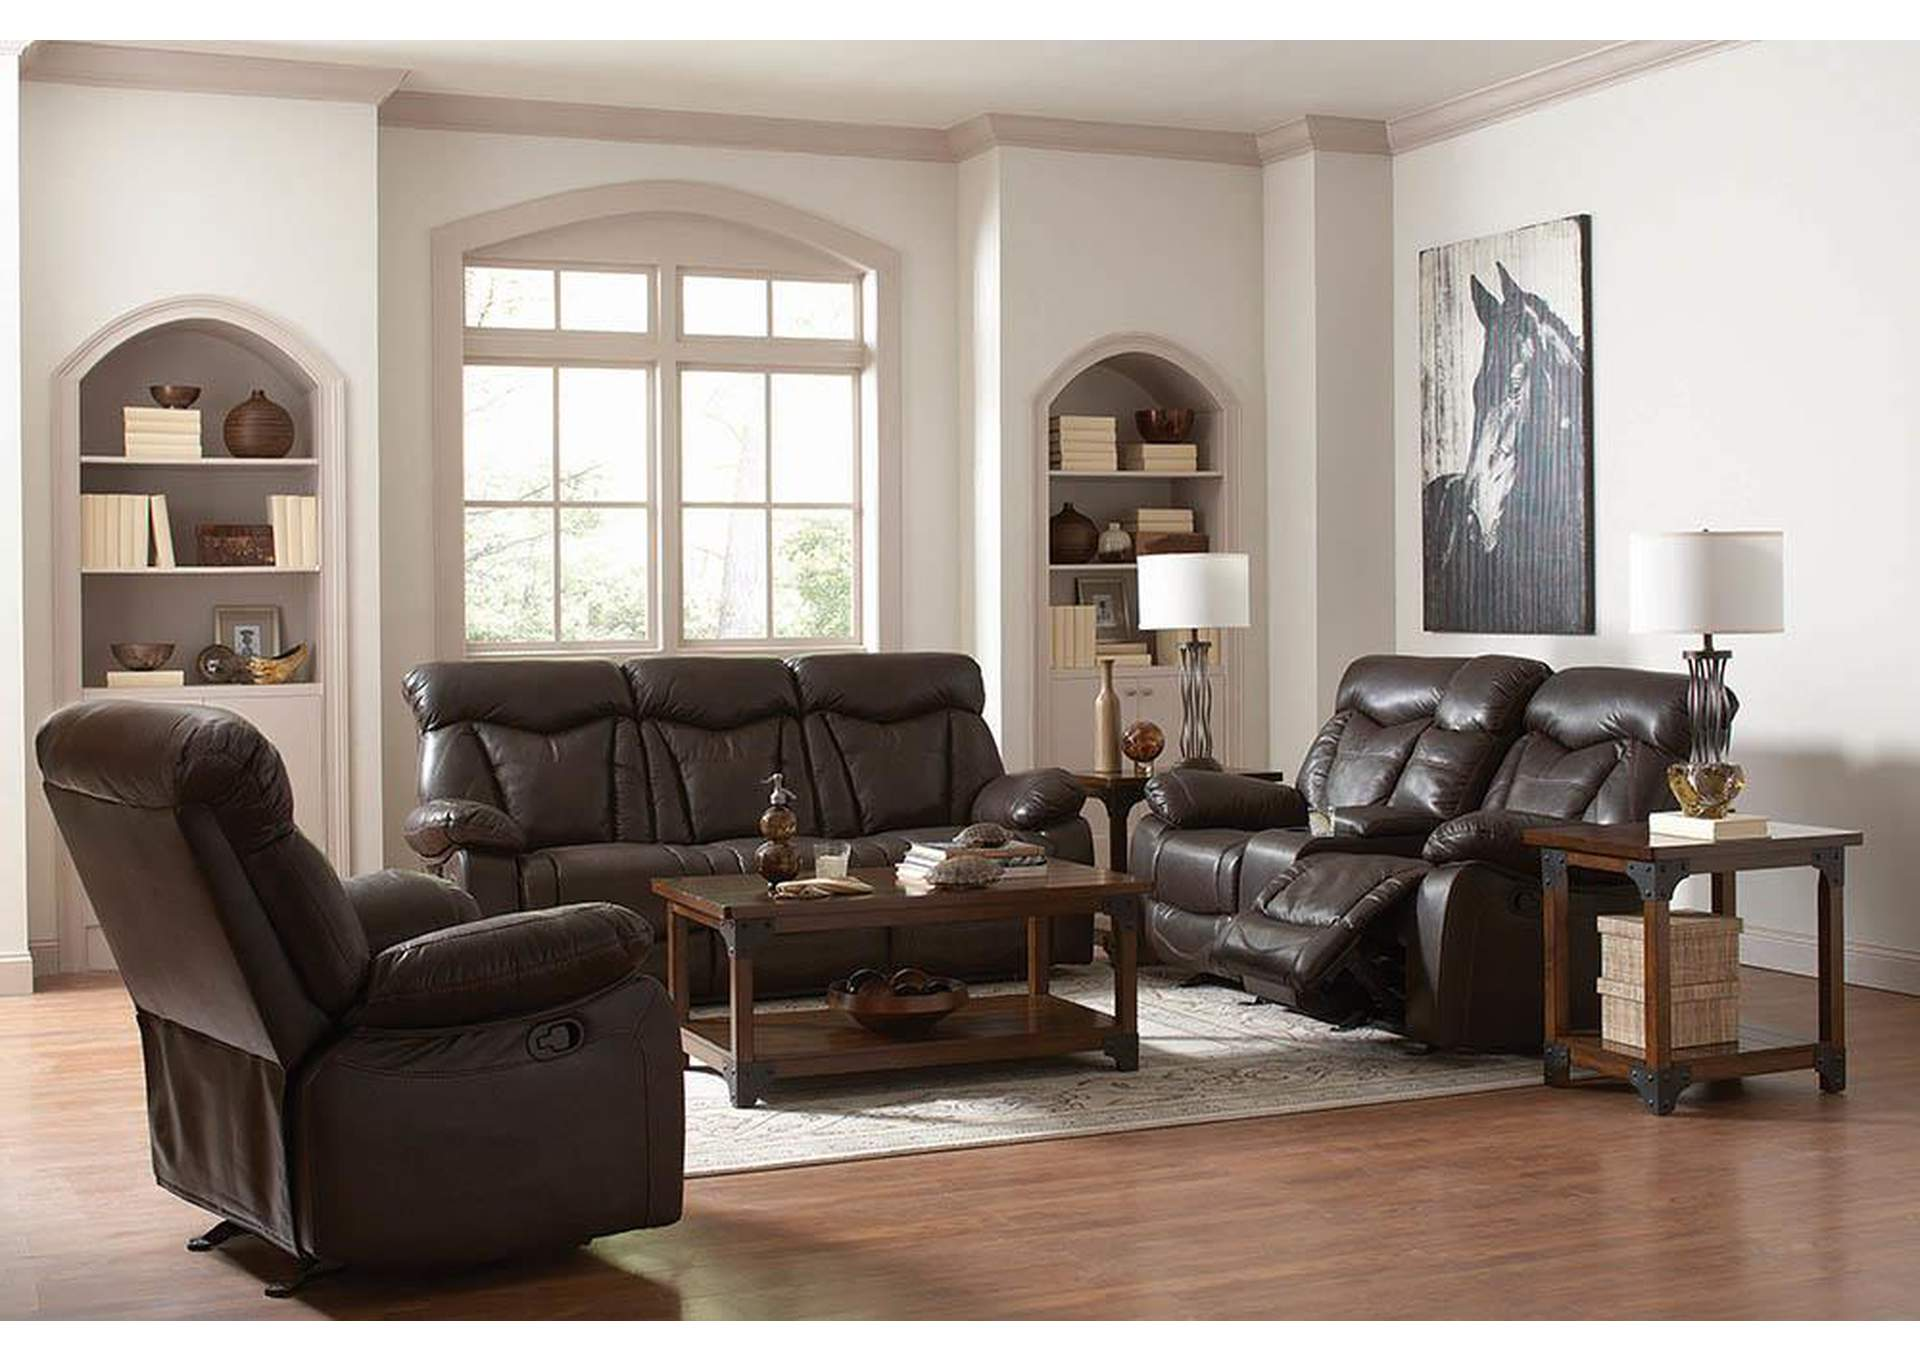 Furniture Distributors Havelock Nc Power Reclining Loveseat